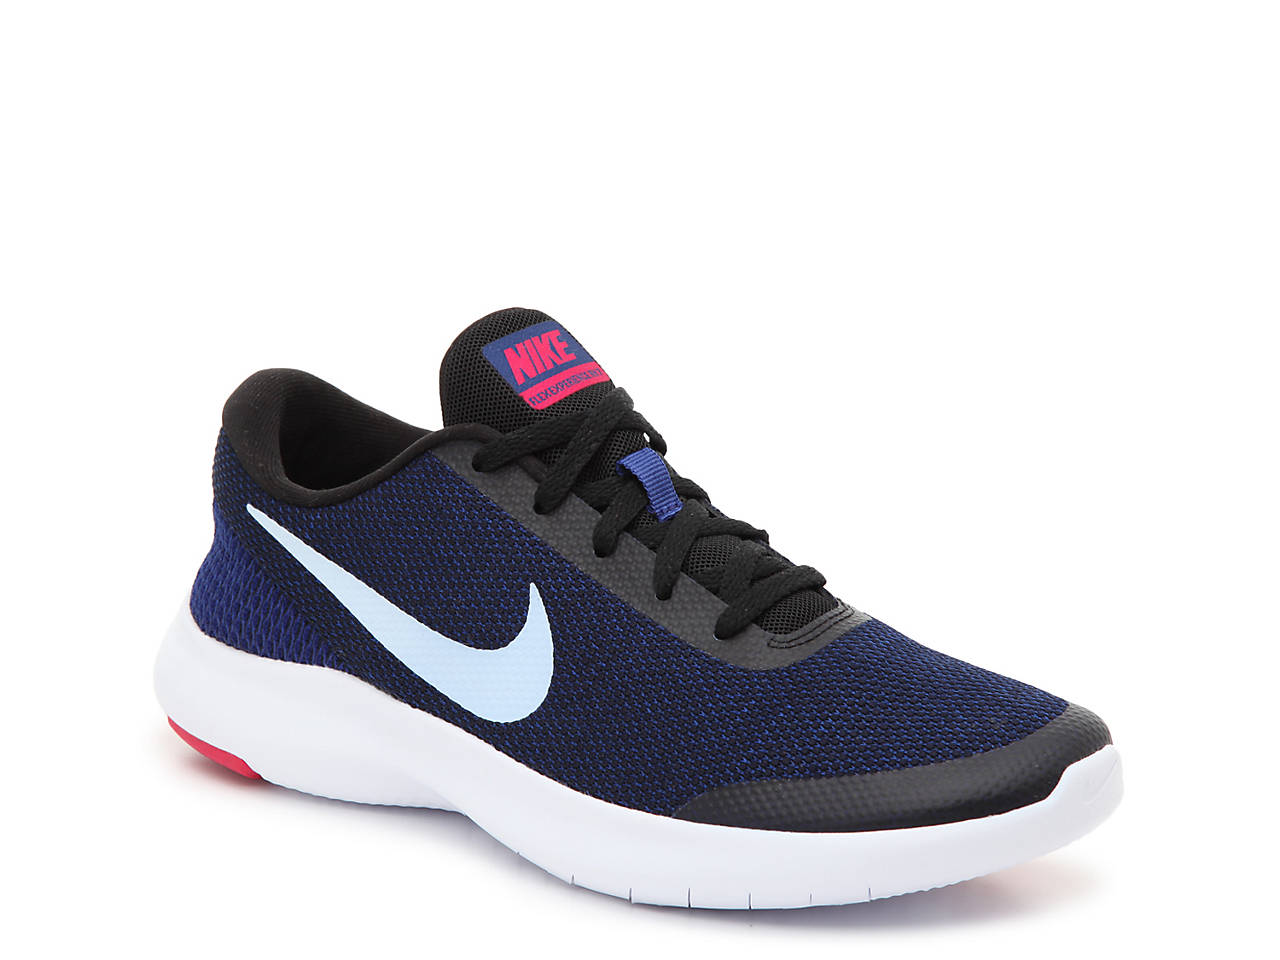 Nike Flex Experience RN 7 Lightweight Running Shoe - Women s Women s ... 0b7cac90cce7